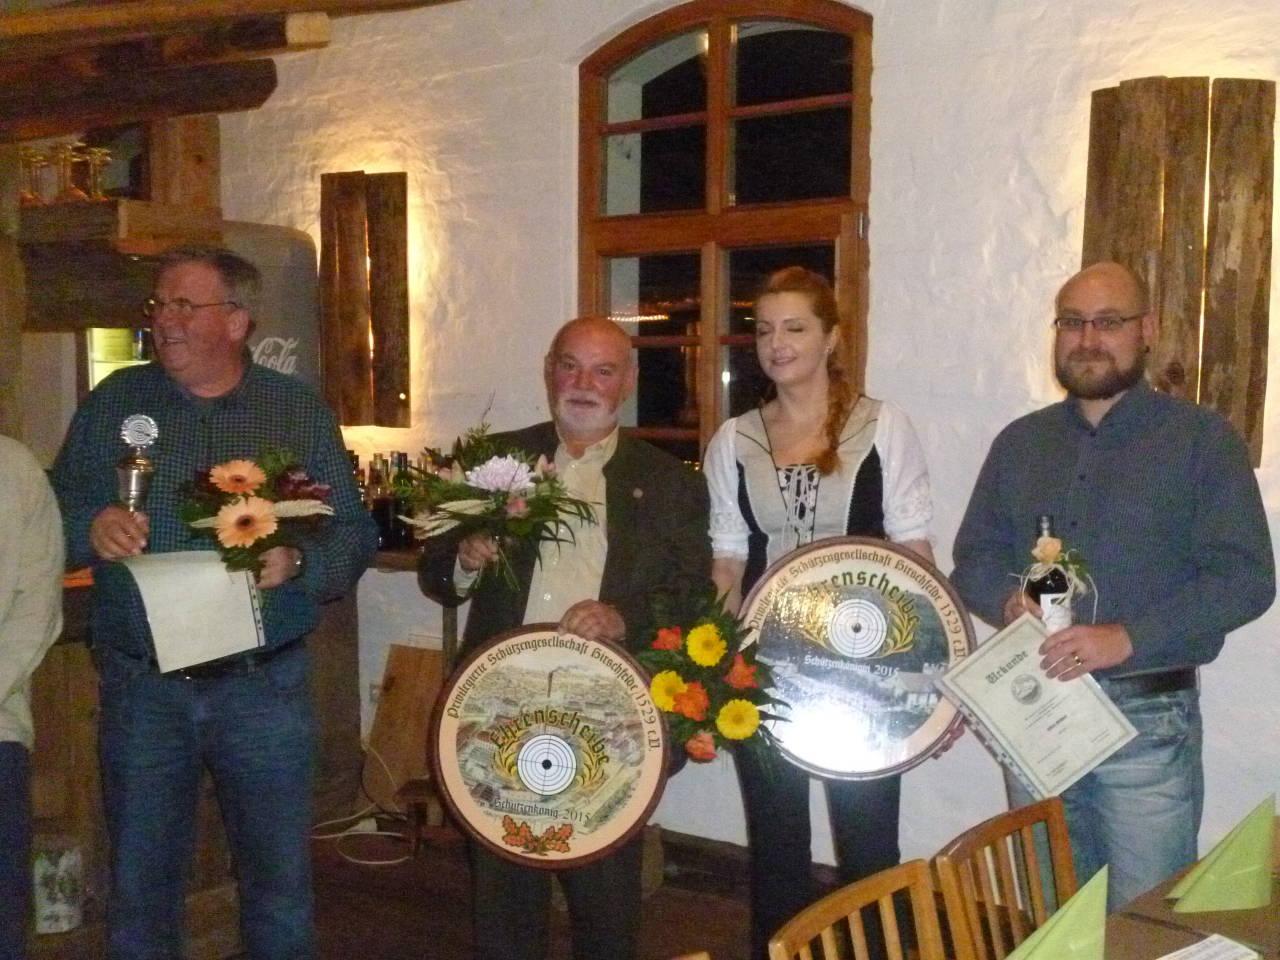 Schützenkönige 2015